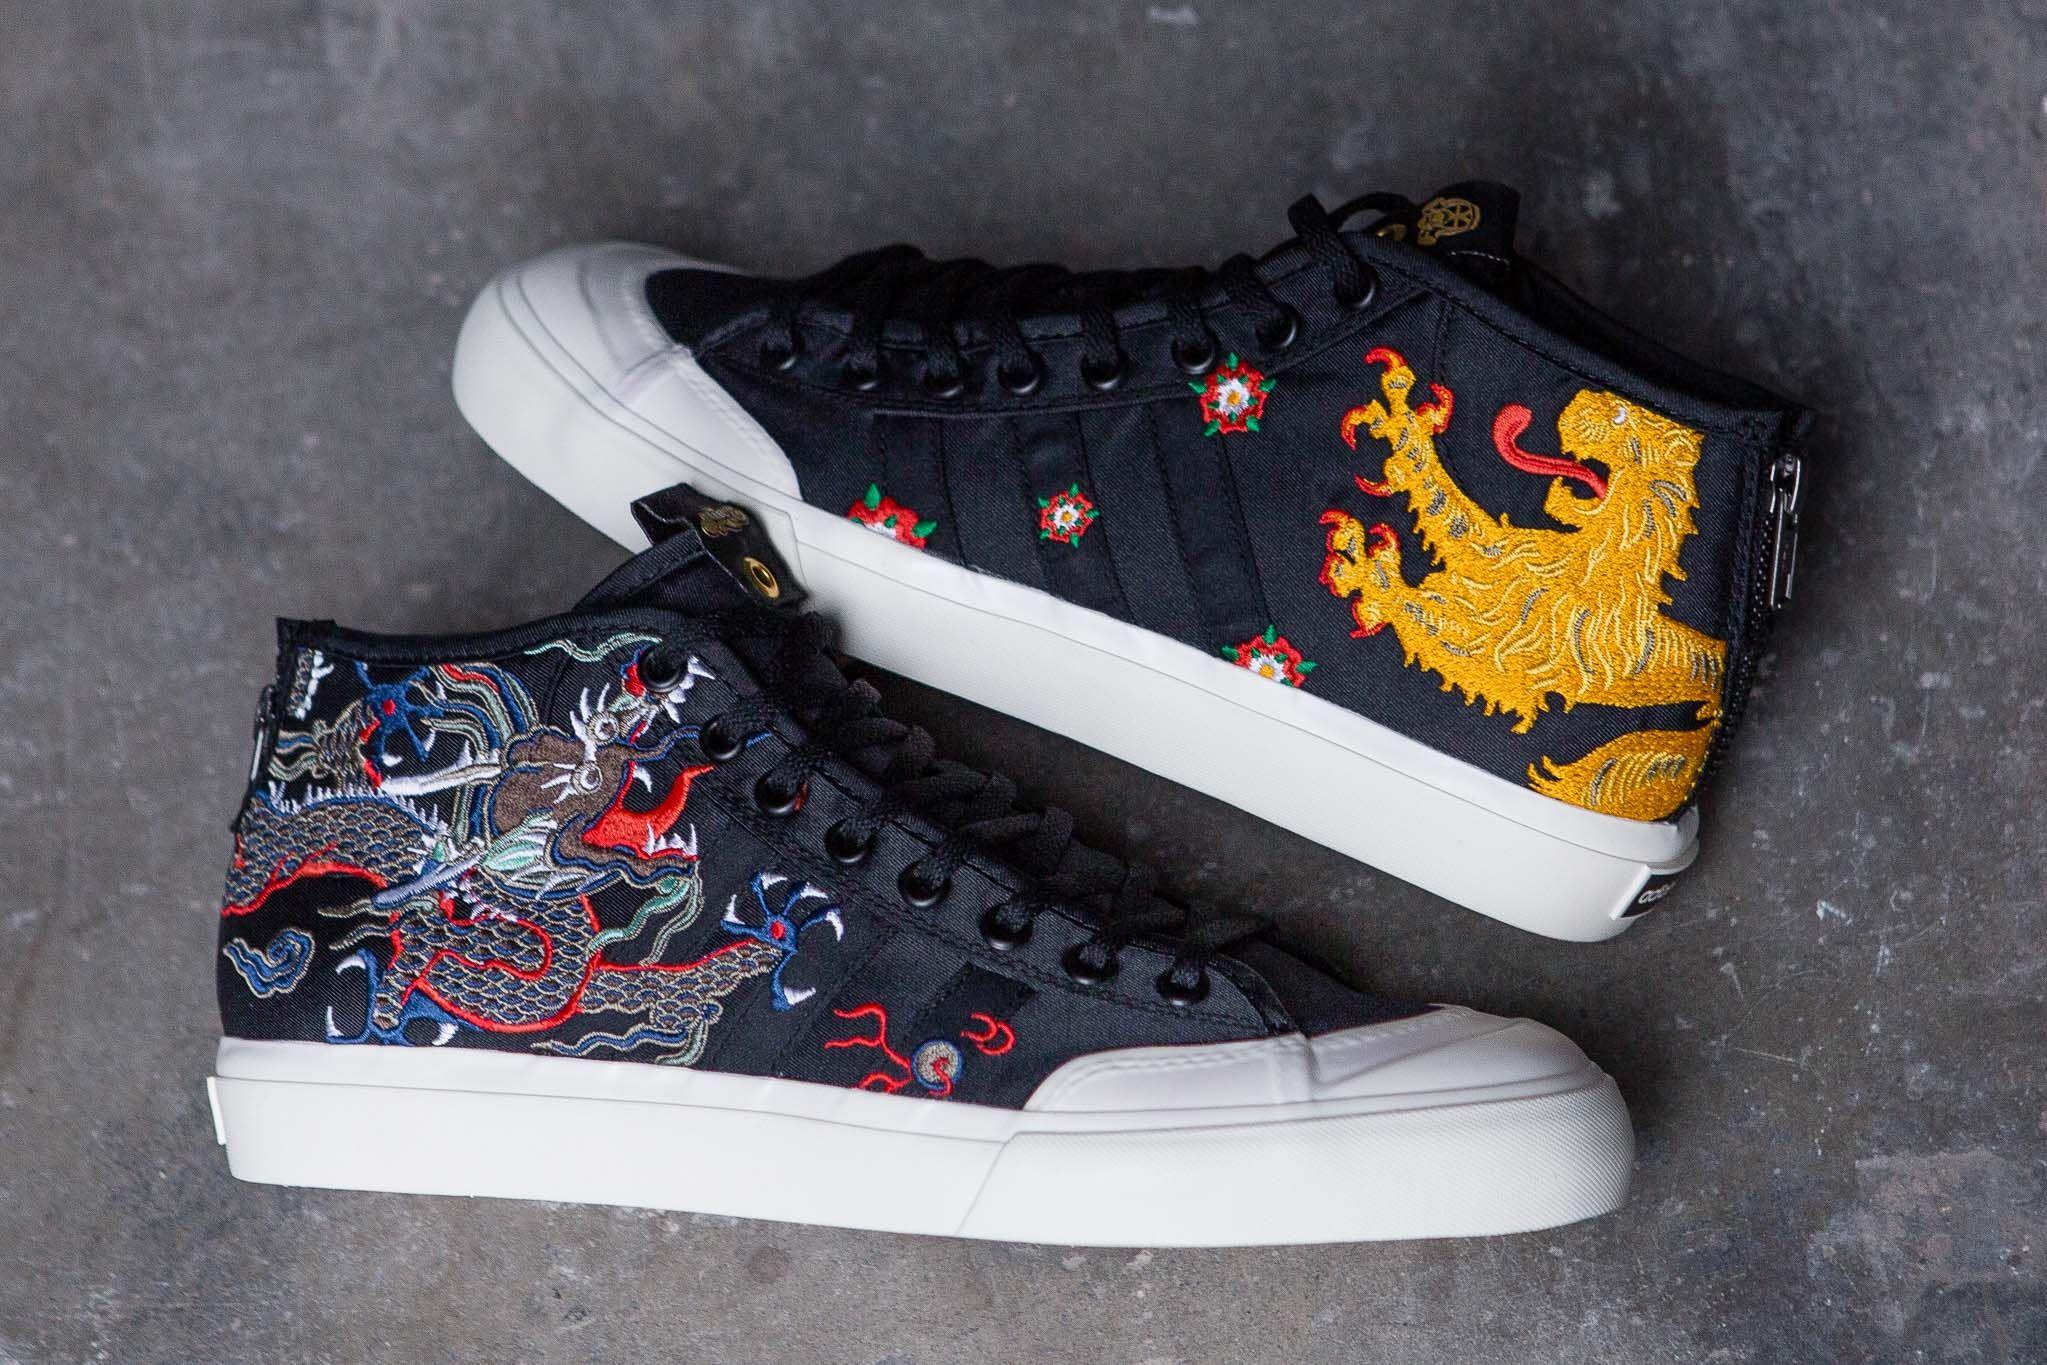 new products eb29d 9e91f Juice x Footpatrol x adidas Consortium Sneaker Exchange - EU Kicks Sneaker  Magazine